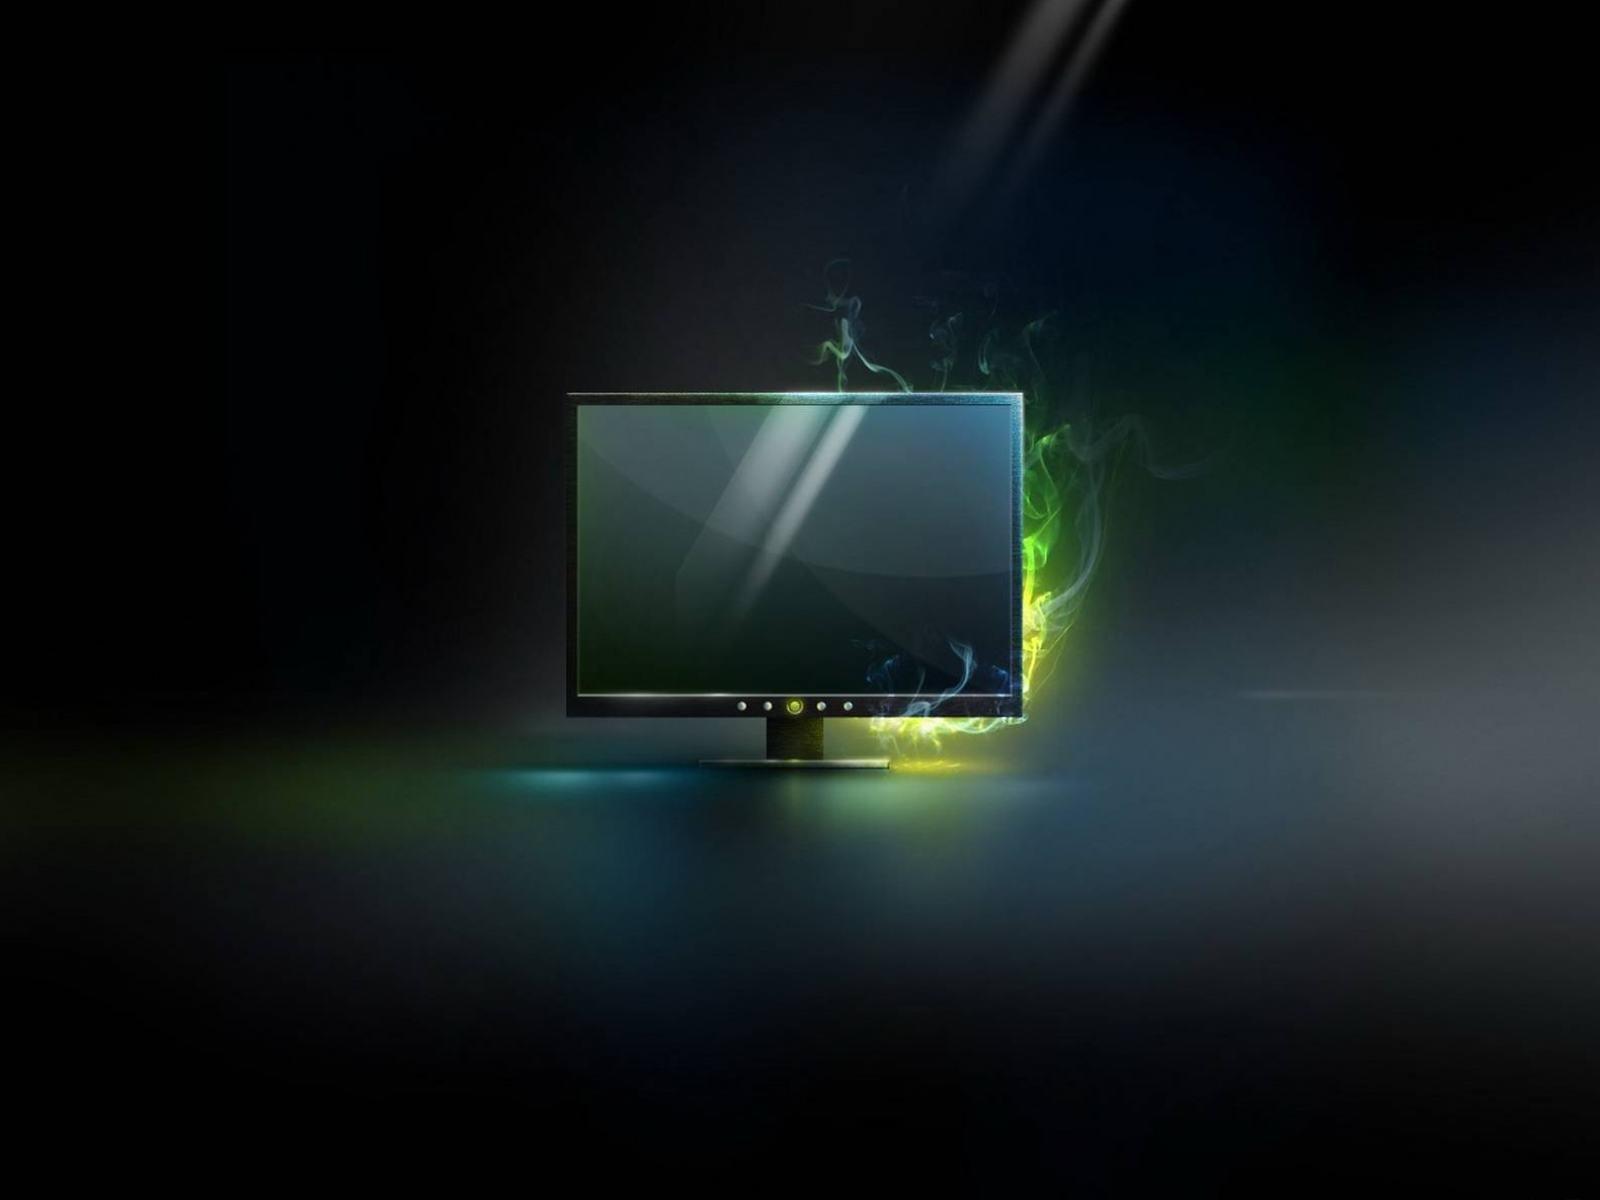 monitor_1600x1200